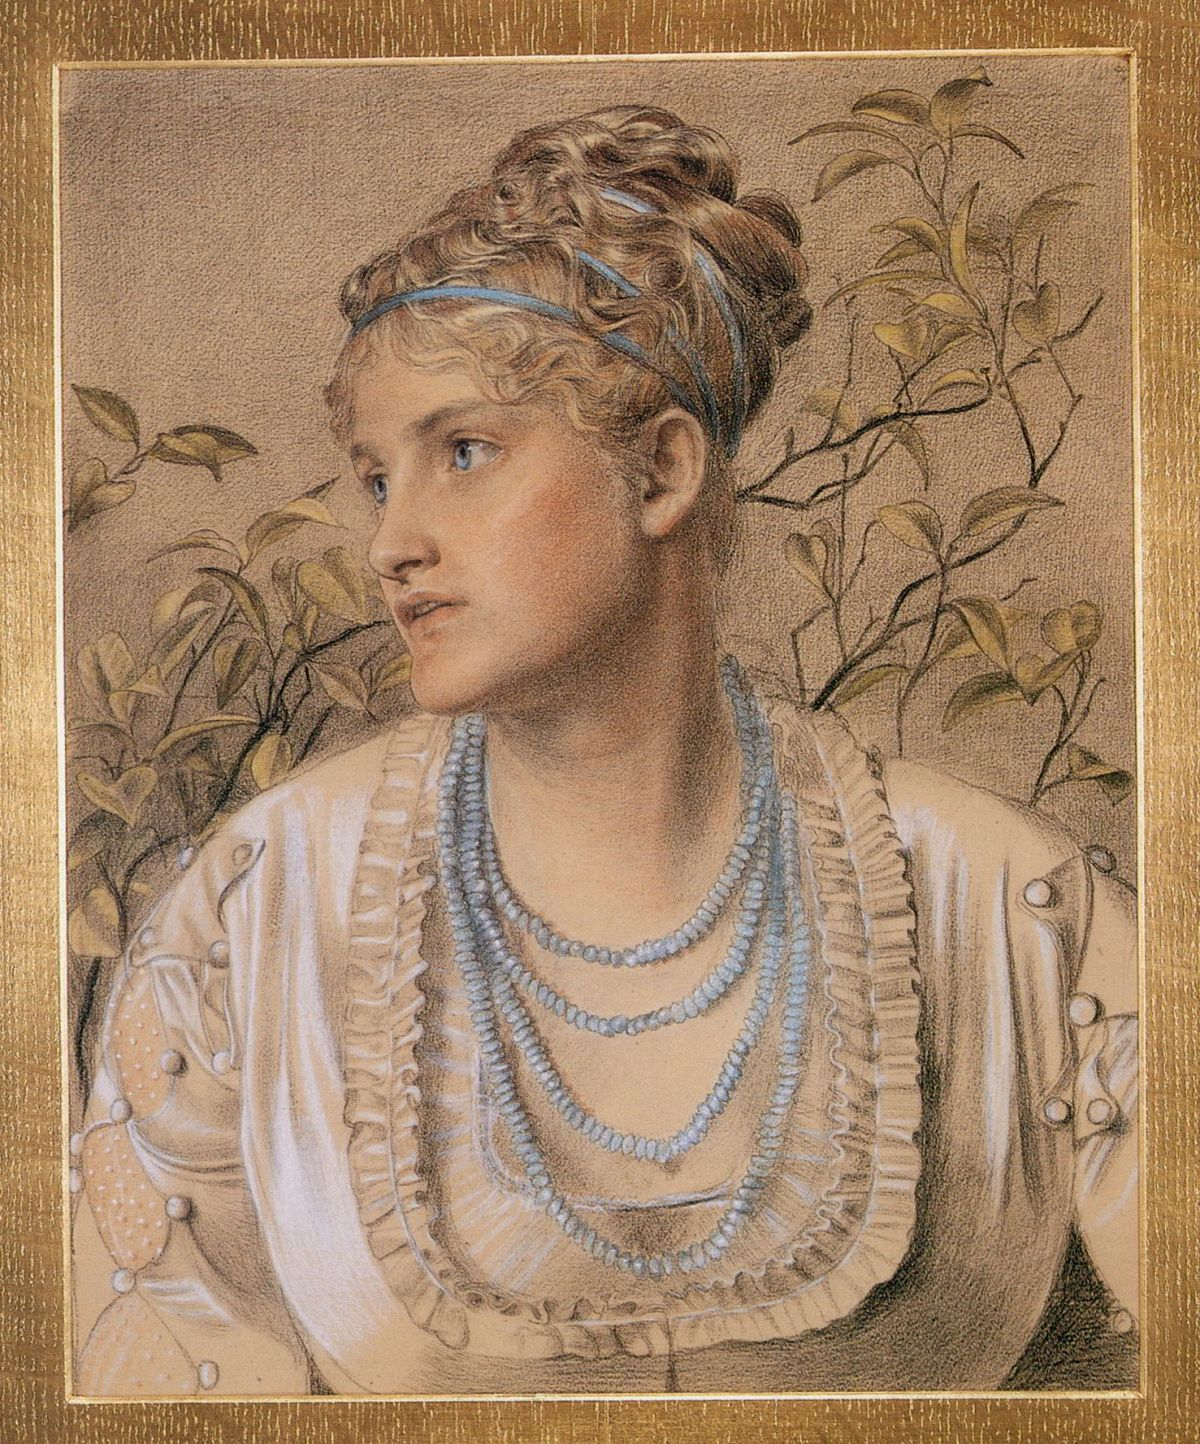 Mary Sandys by Anthony Frederick Sandys